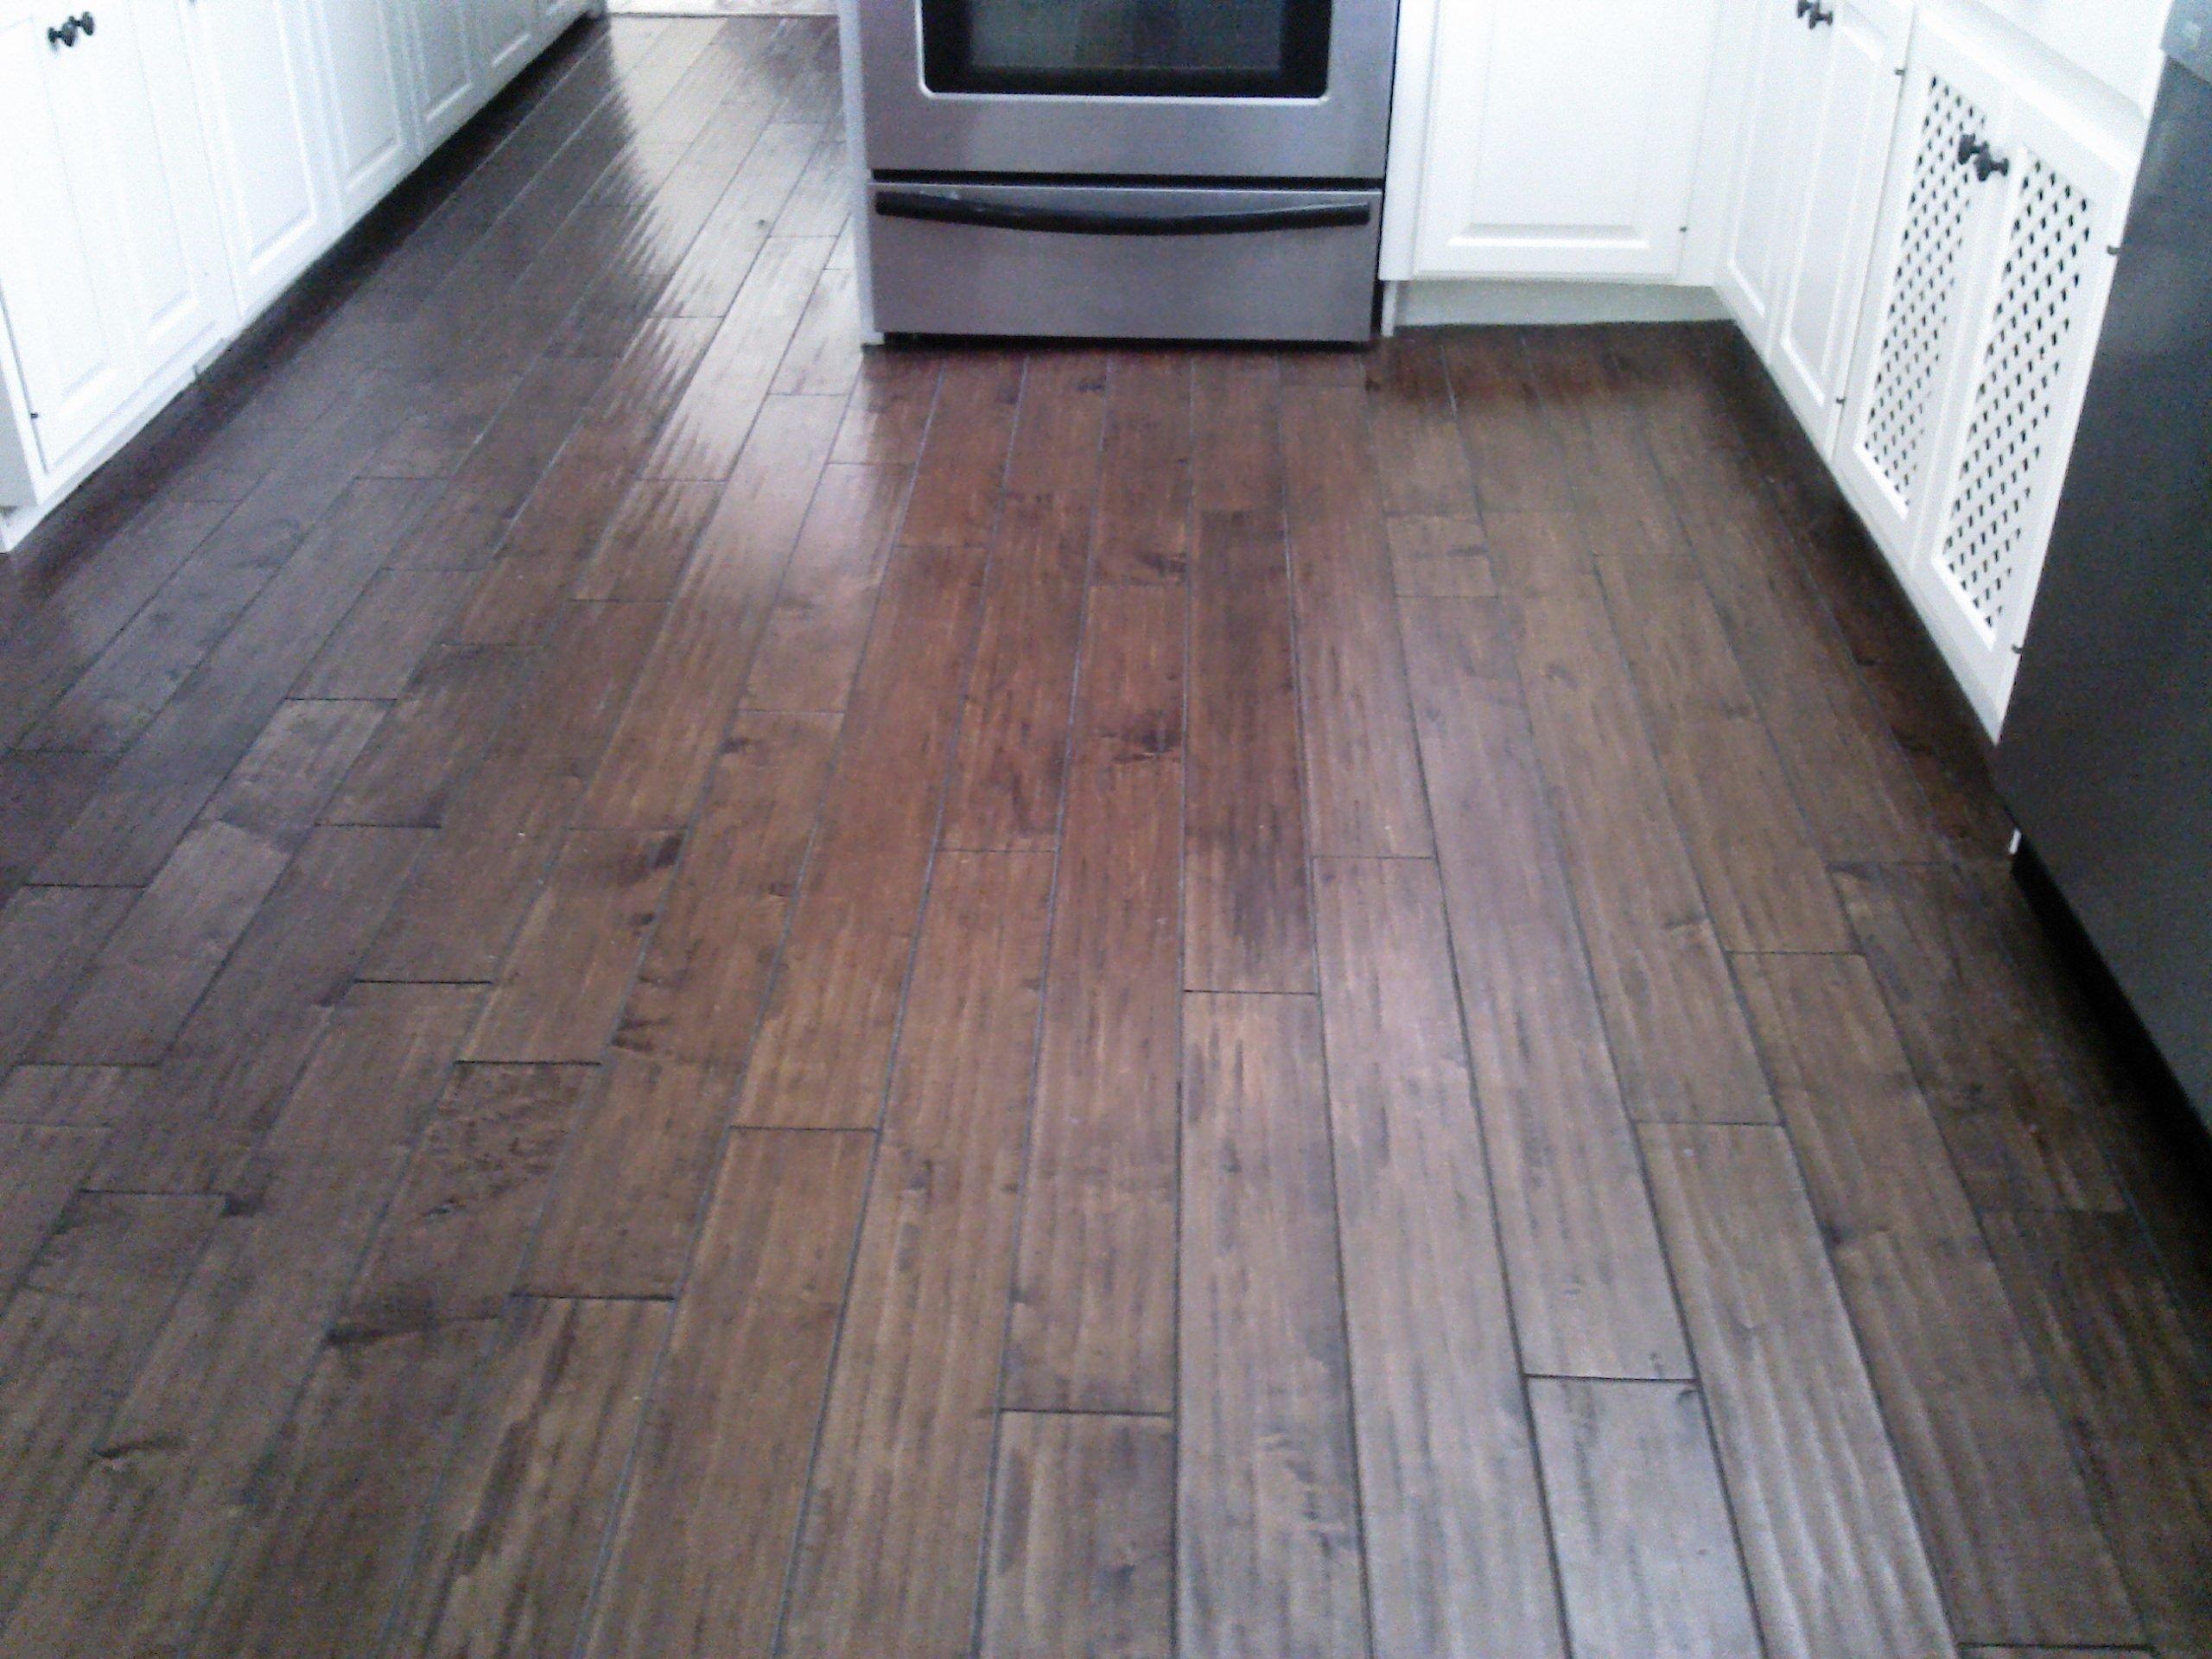 Laminate Wood Flooring in Kitchen Ratings Reviews wood floors in kitchen